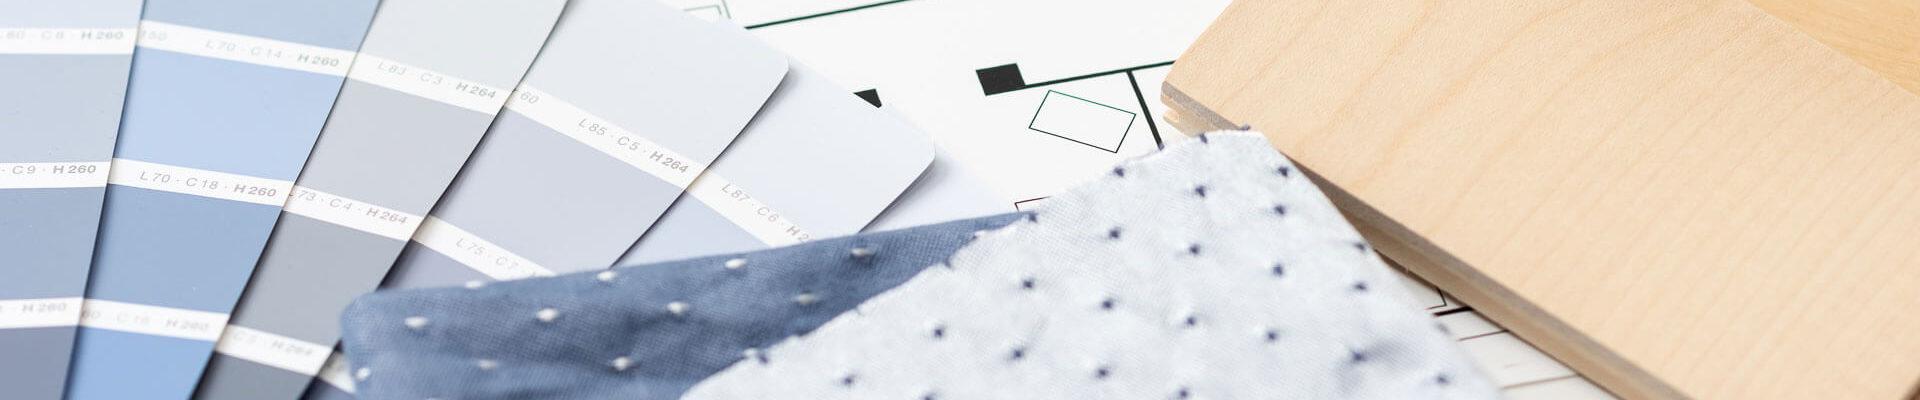 Neugestaltung-Inspiration-Onlinekonzepte